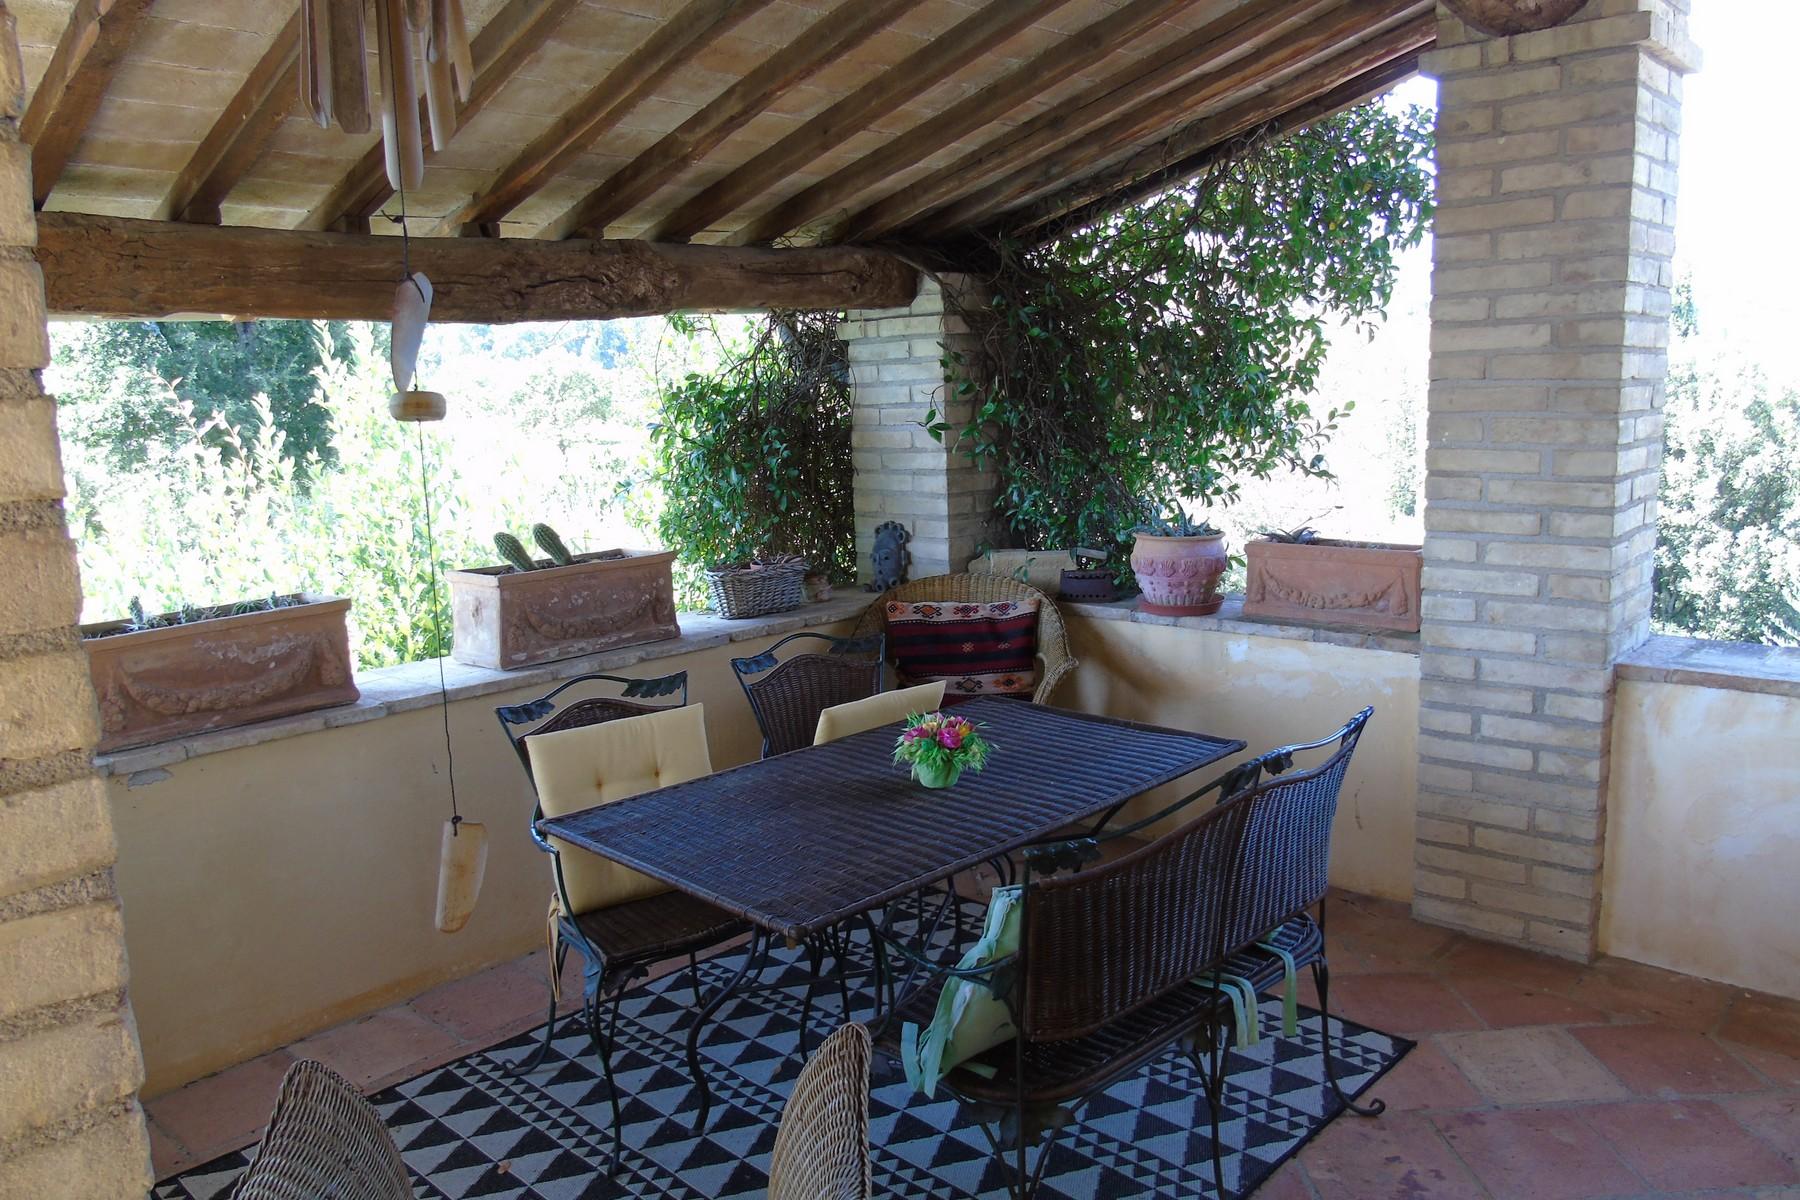 Additional photo for property listing at Lovely farmhouse with panaromic views of Assisi Via dei Colli Bettona Perugia, Perugia 06084 Italien